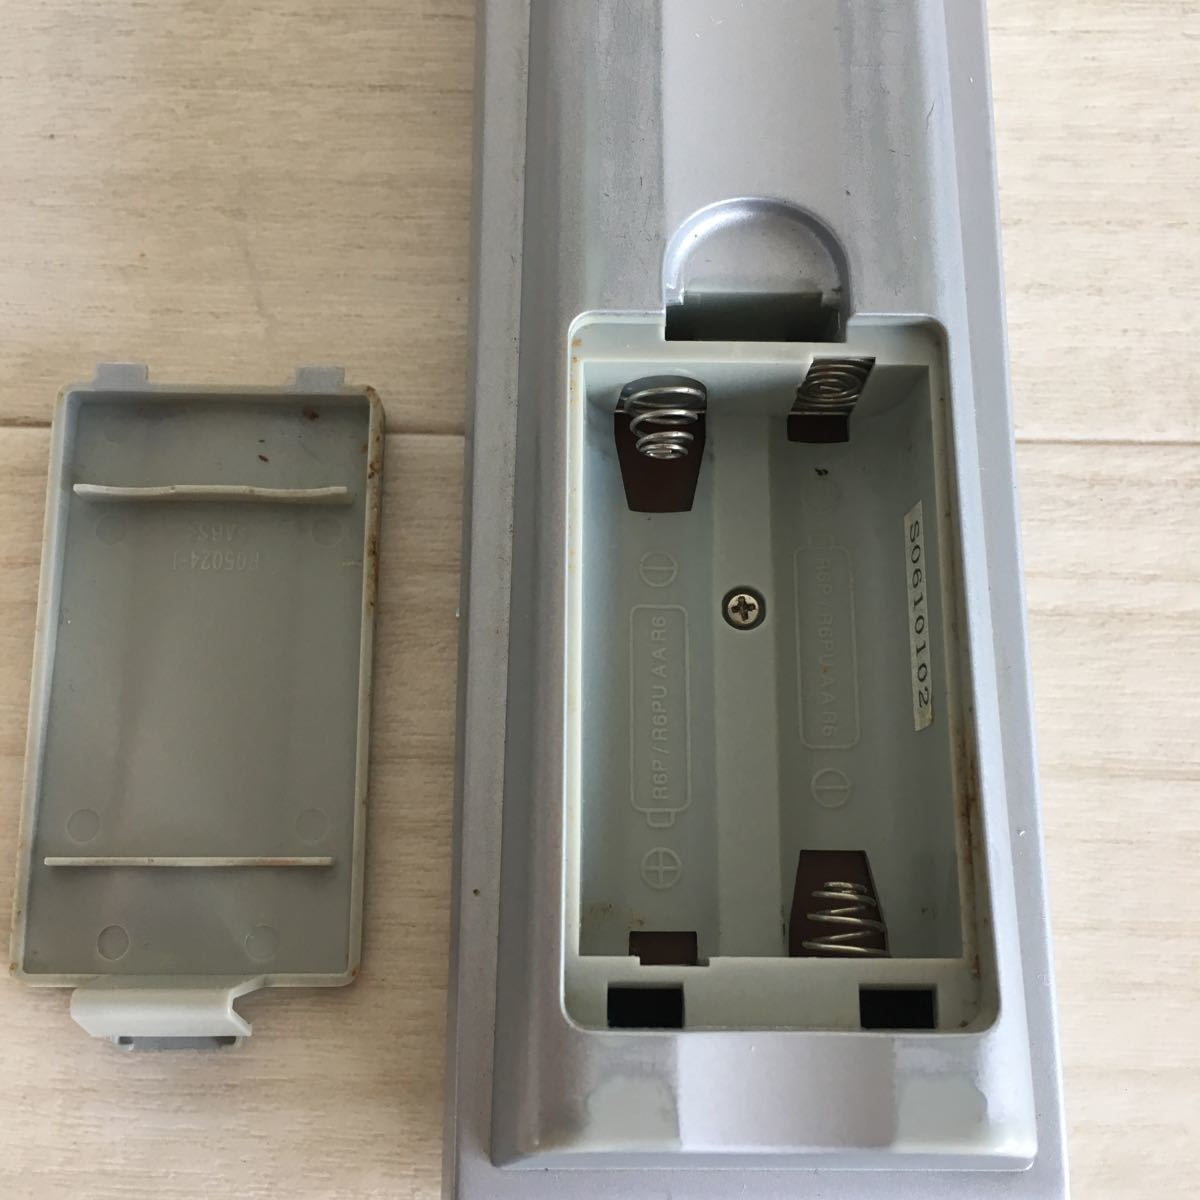 (H101)ビクター テレビリモコン RM-C2100 LH LC 送料無料_画像6